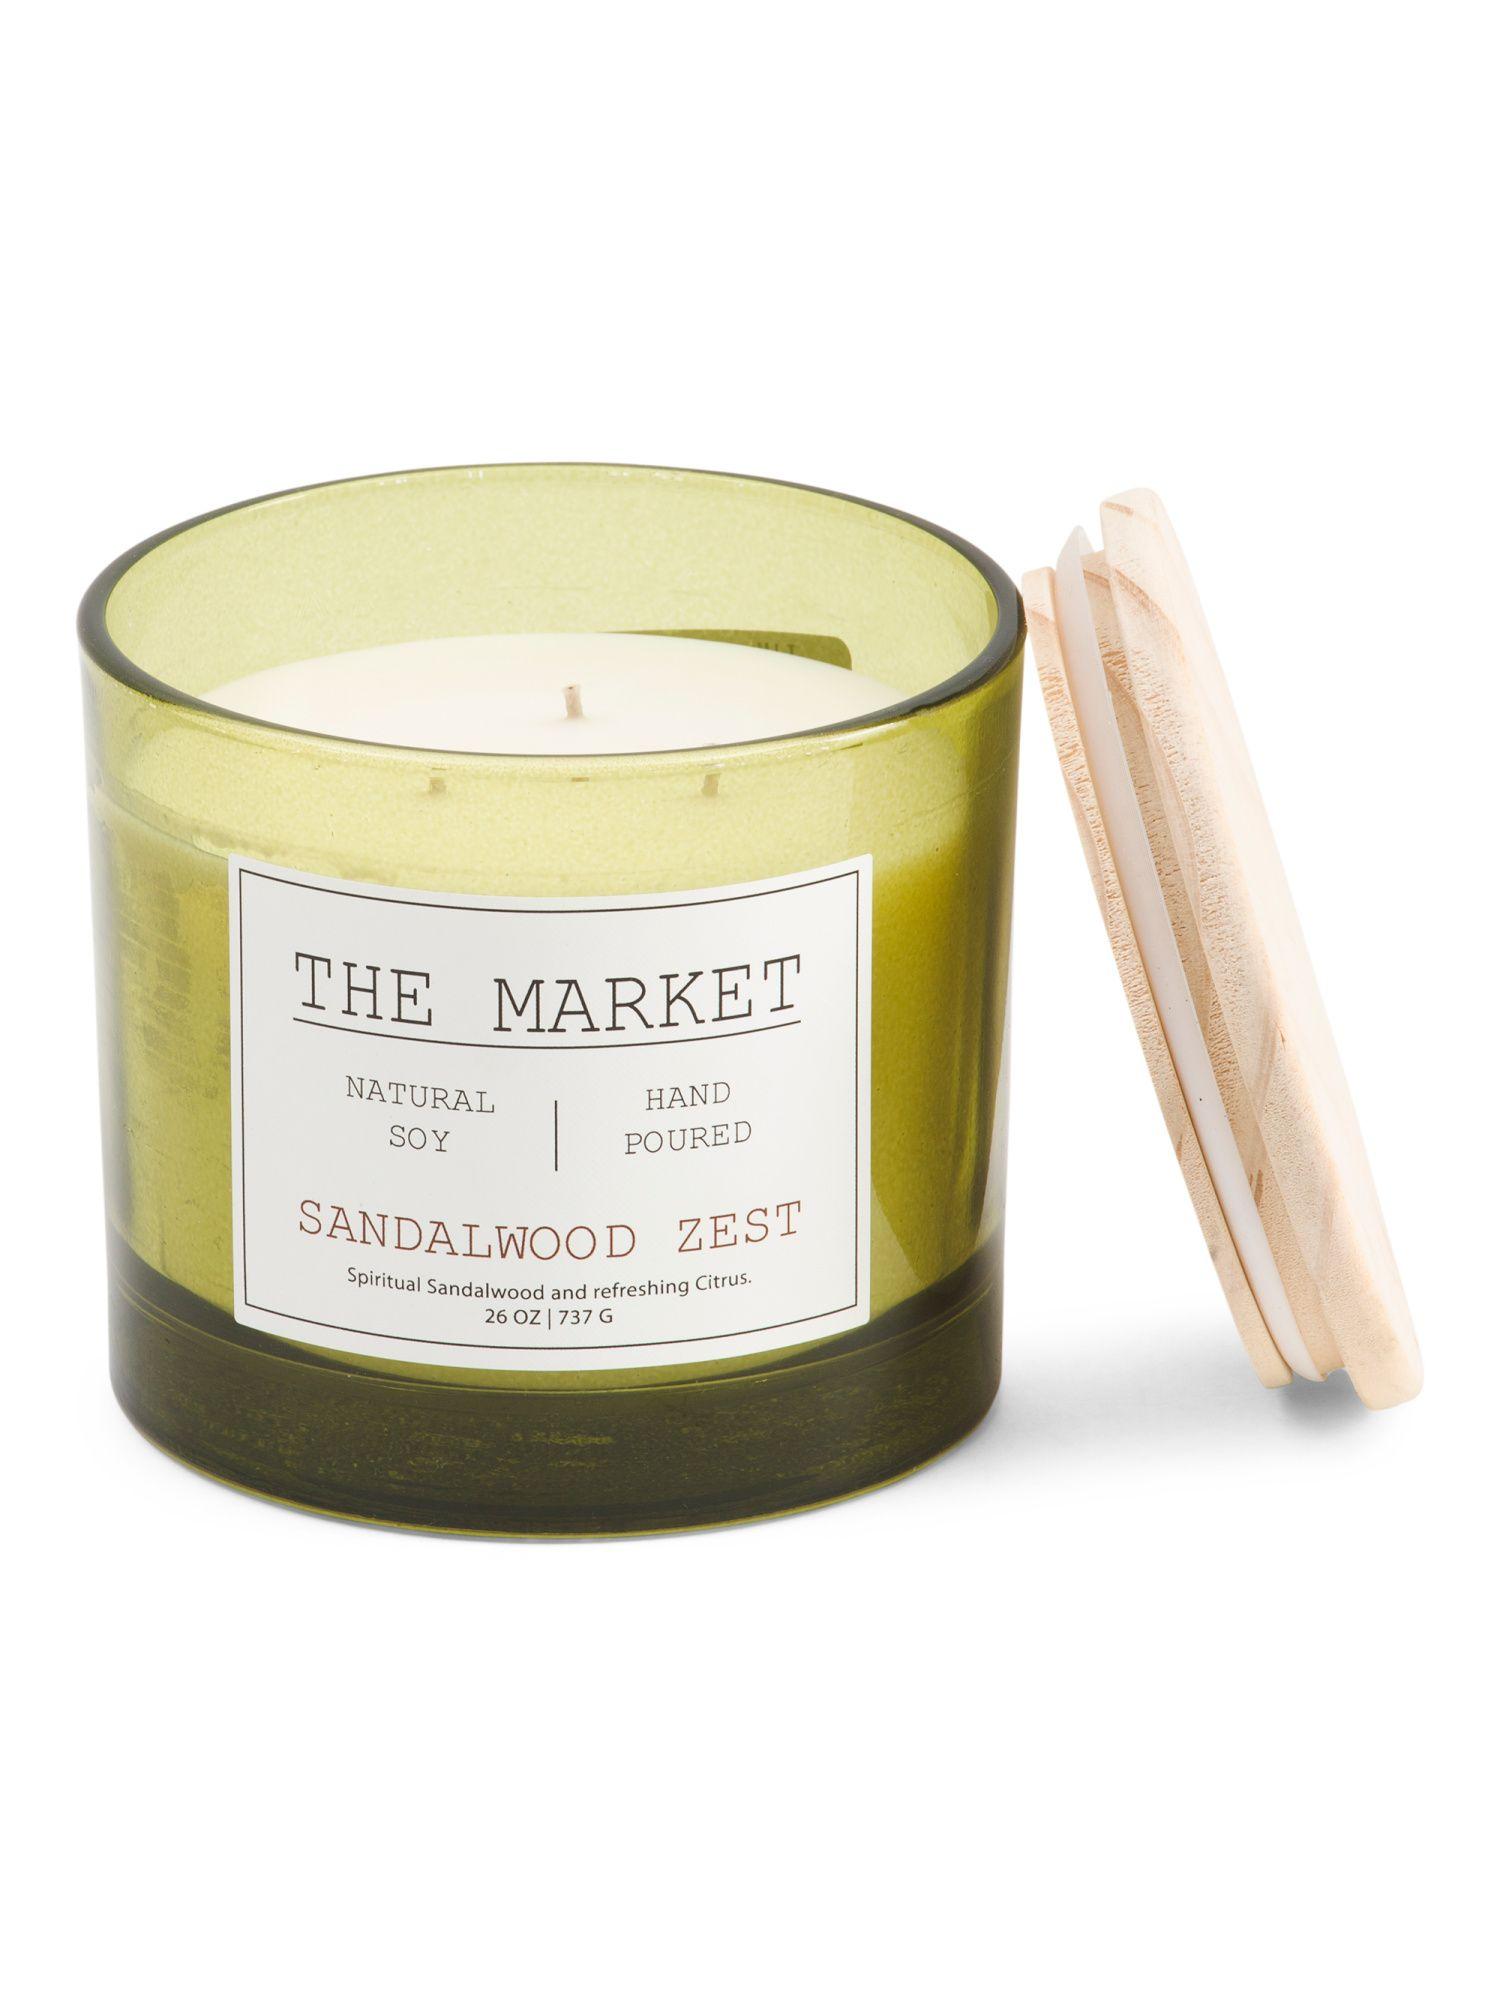 Made In Usa 26oz Sandalwood Zest Candle Candles Sandalwood Sandalwood Scent